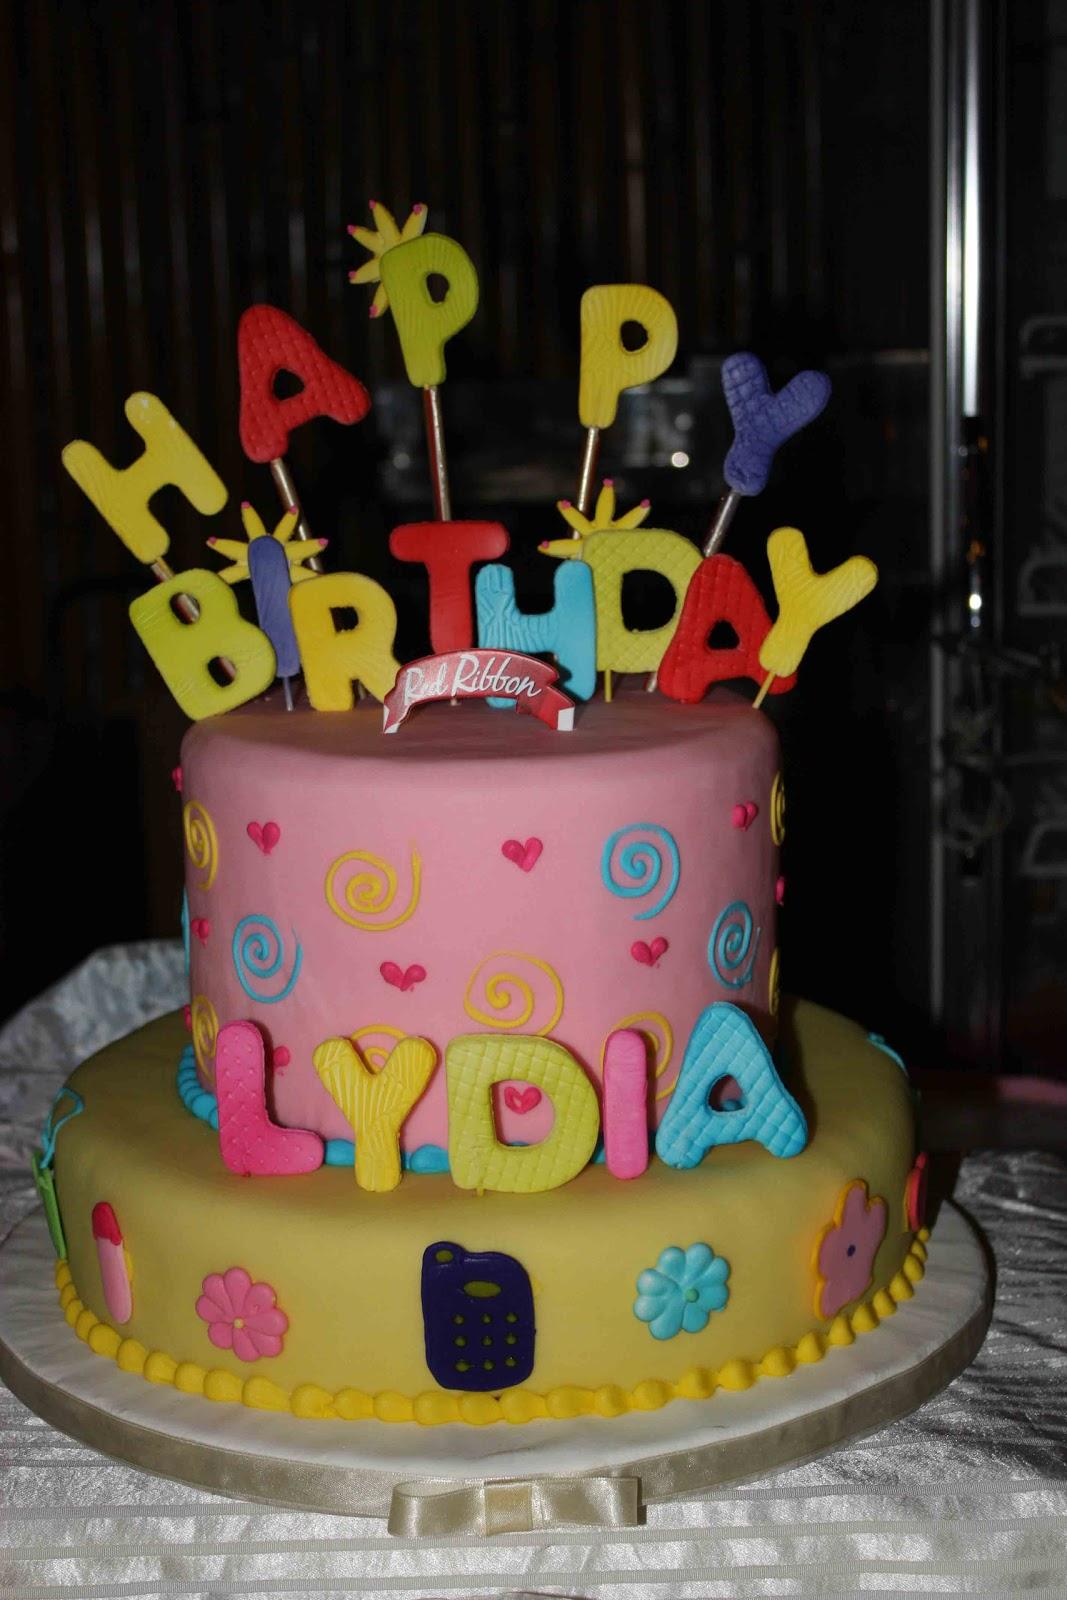 7 Red Ribbon Birthday Cakes Designs Photo Birthday Cake Designs